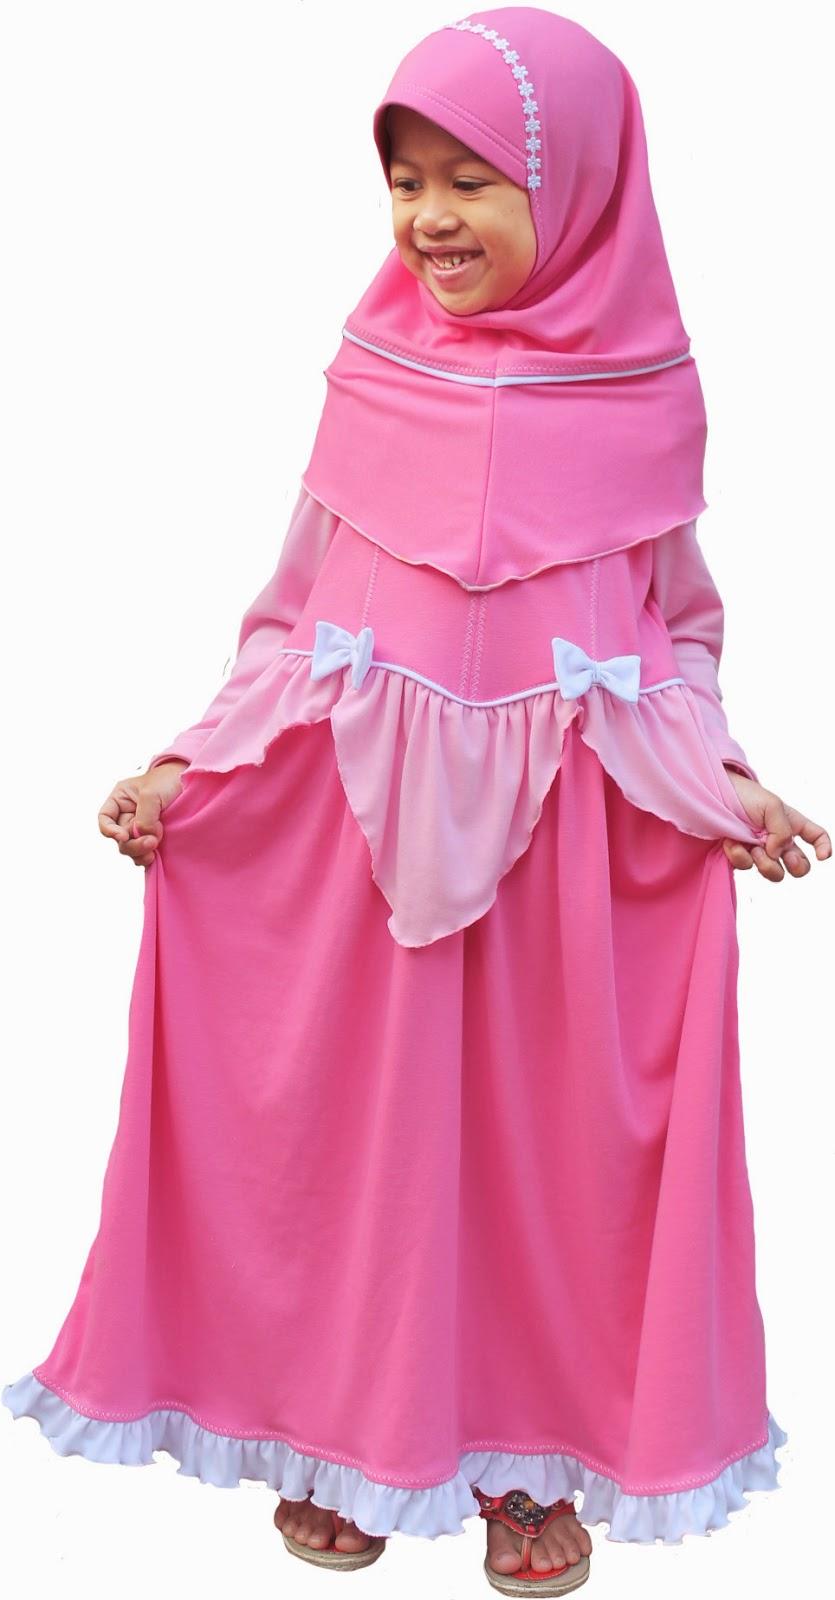 30+ Model Baju Fashion Show Anak Perempuan Muslim